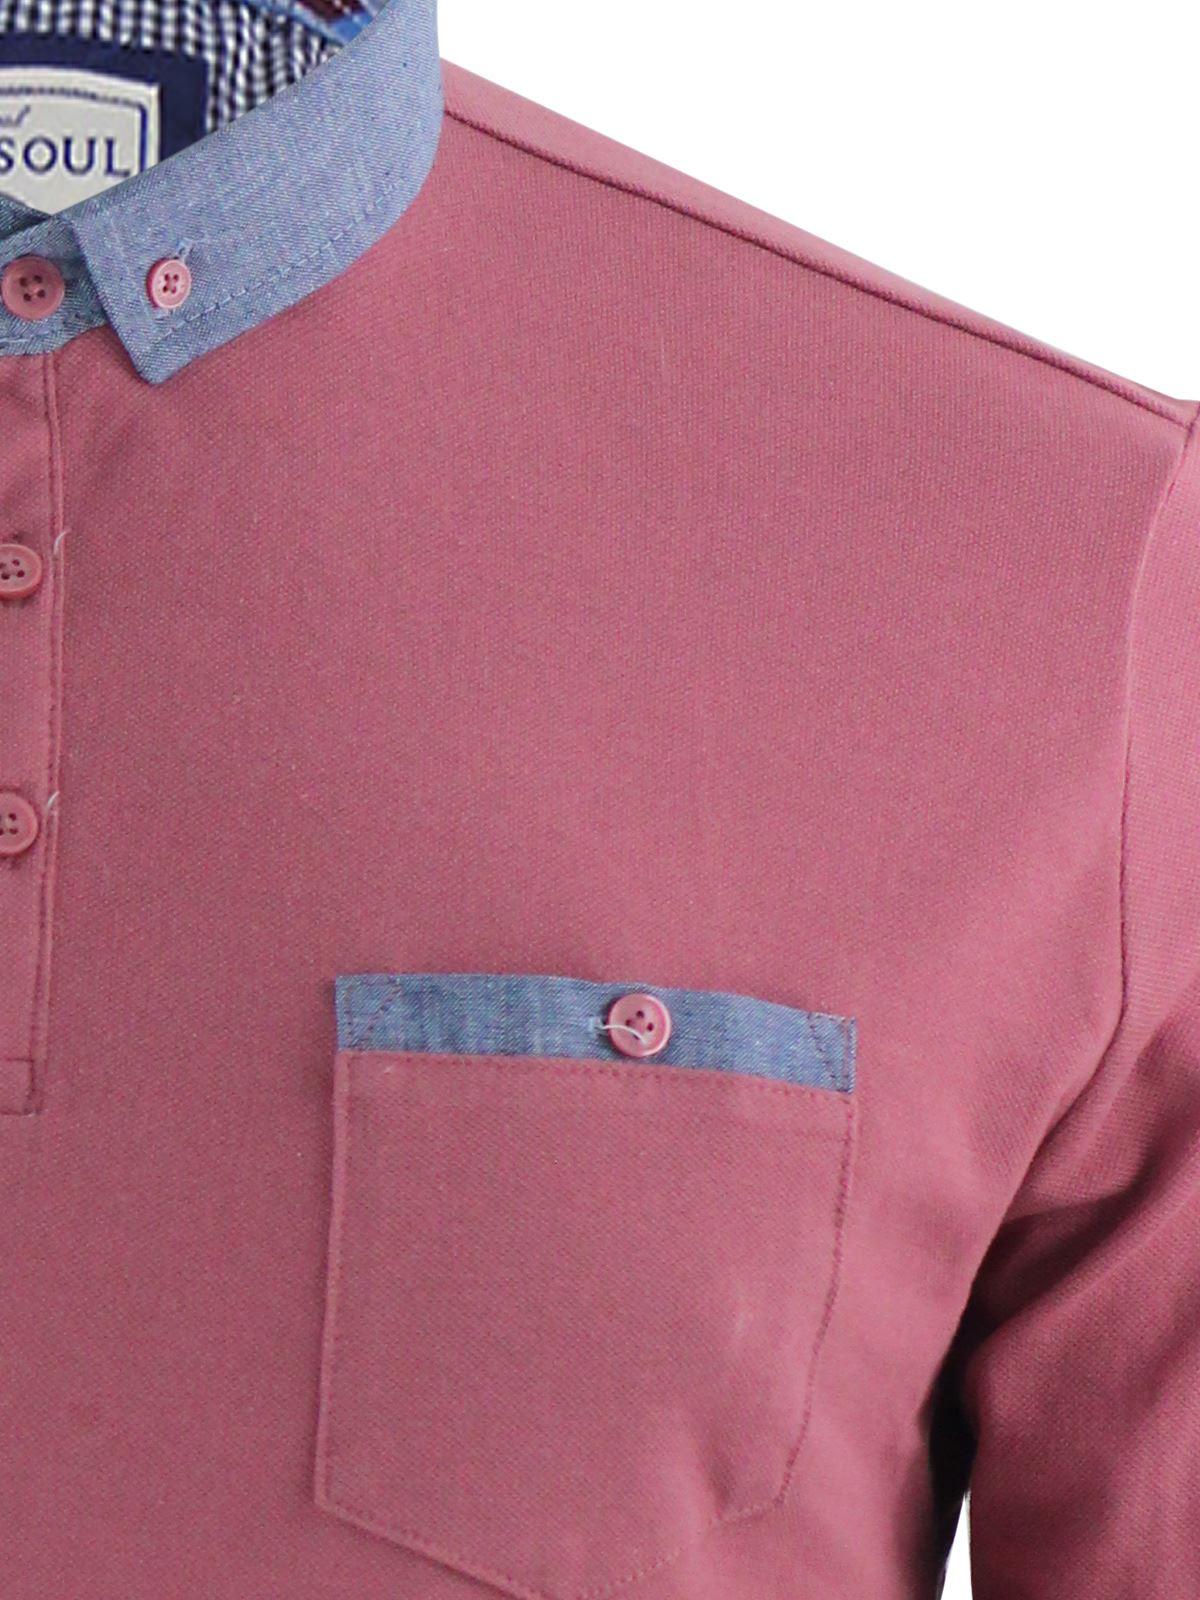 Para-Hombre-Polo-T-Shirt-Alma-valiente-Hera-Manga-Larga-De-Algodon-Casual-Top miniatura 22